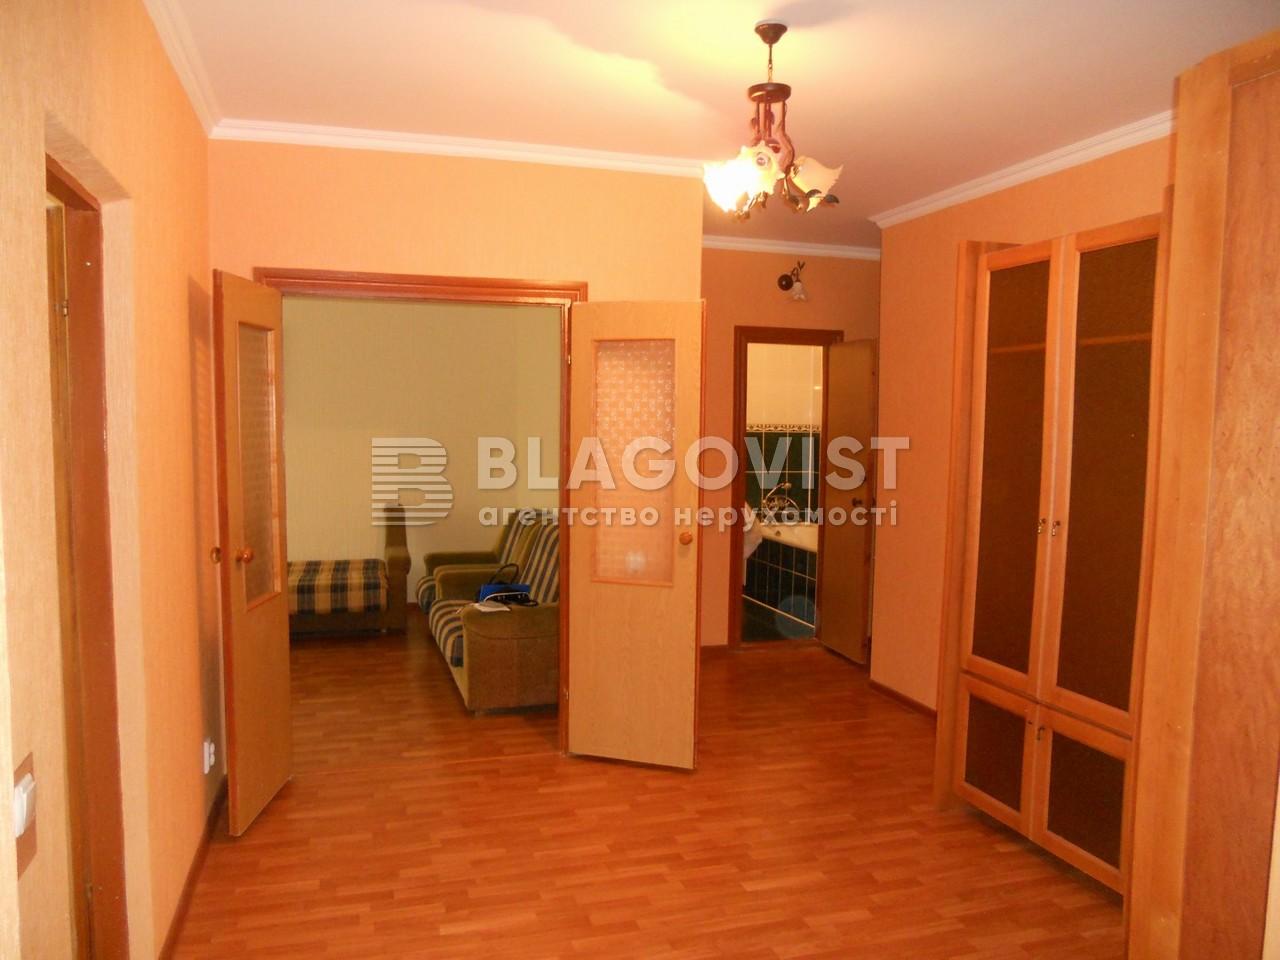 Квартира E-7318, Вишняківська, 13, Київ - Фото 17